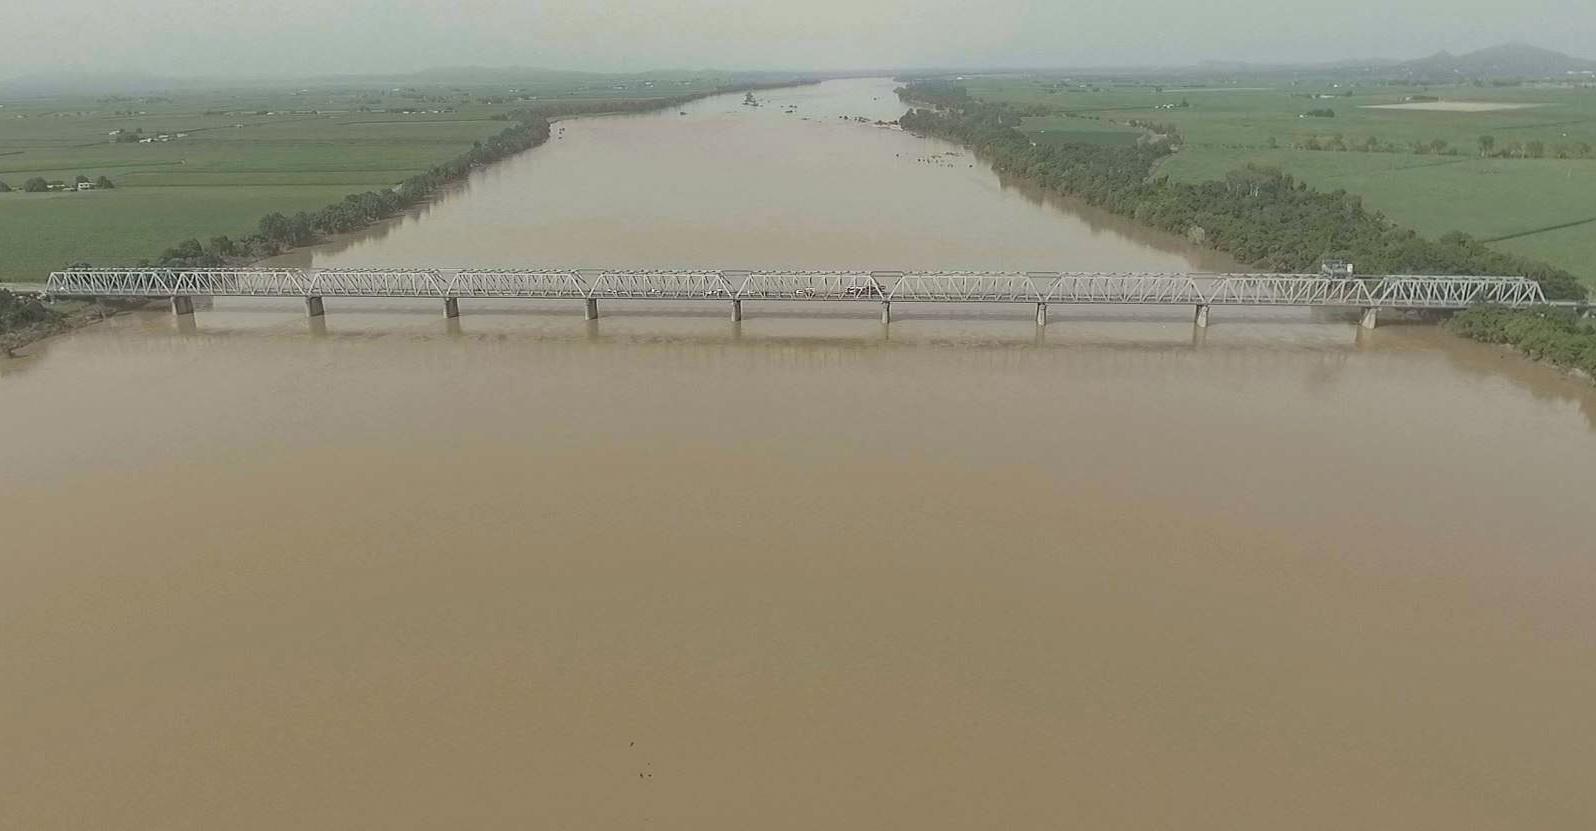 Burdekin River in flood Feb 2019